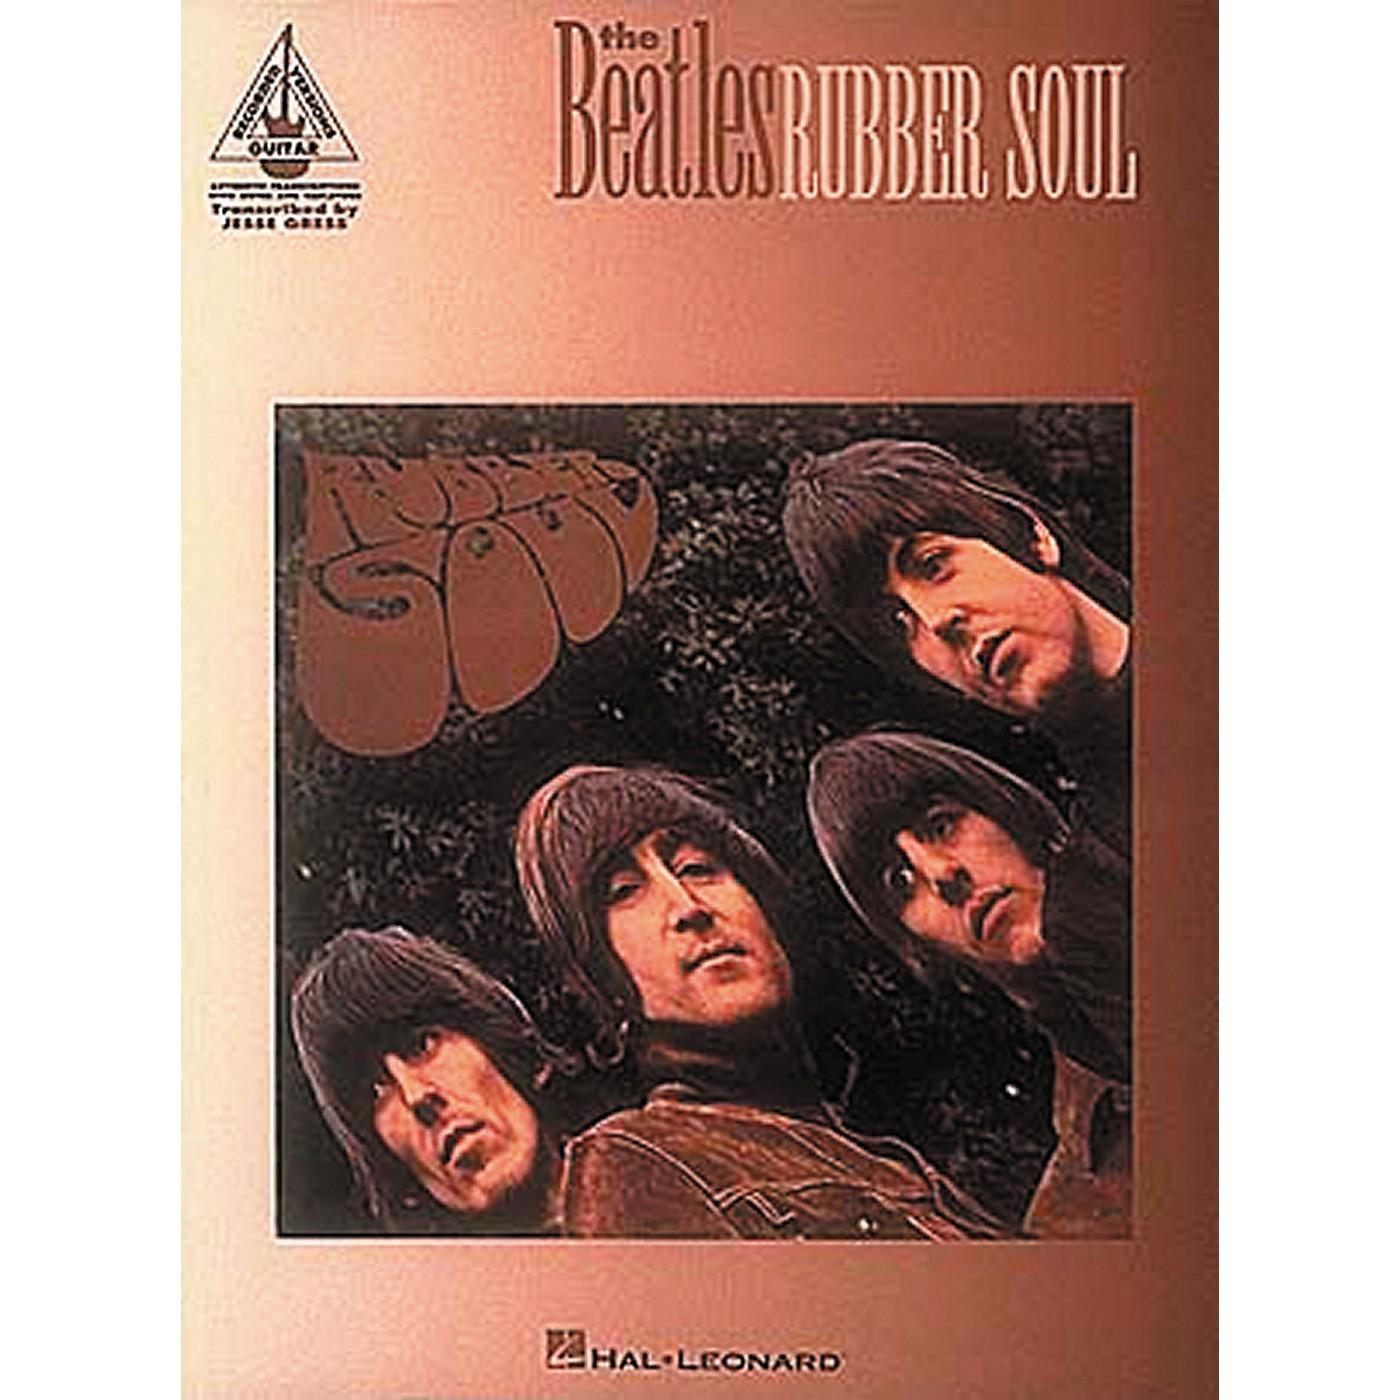 Hal Leonard The Beatles Rubber Soul Guitar Tab Book thumbnail